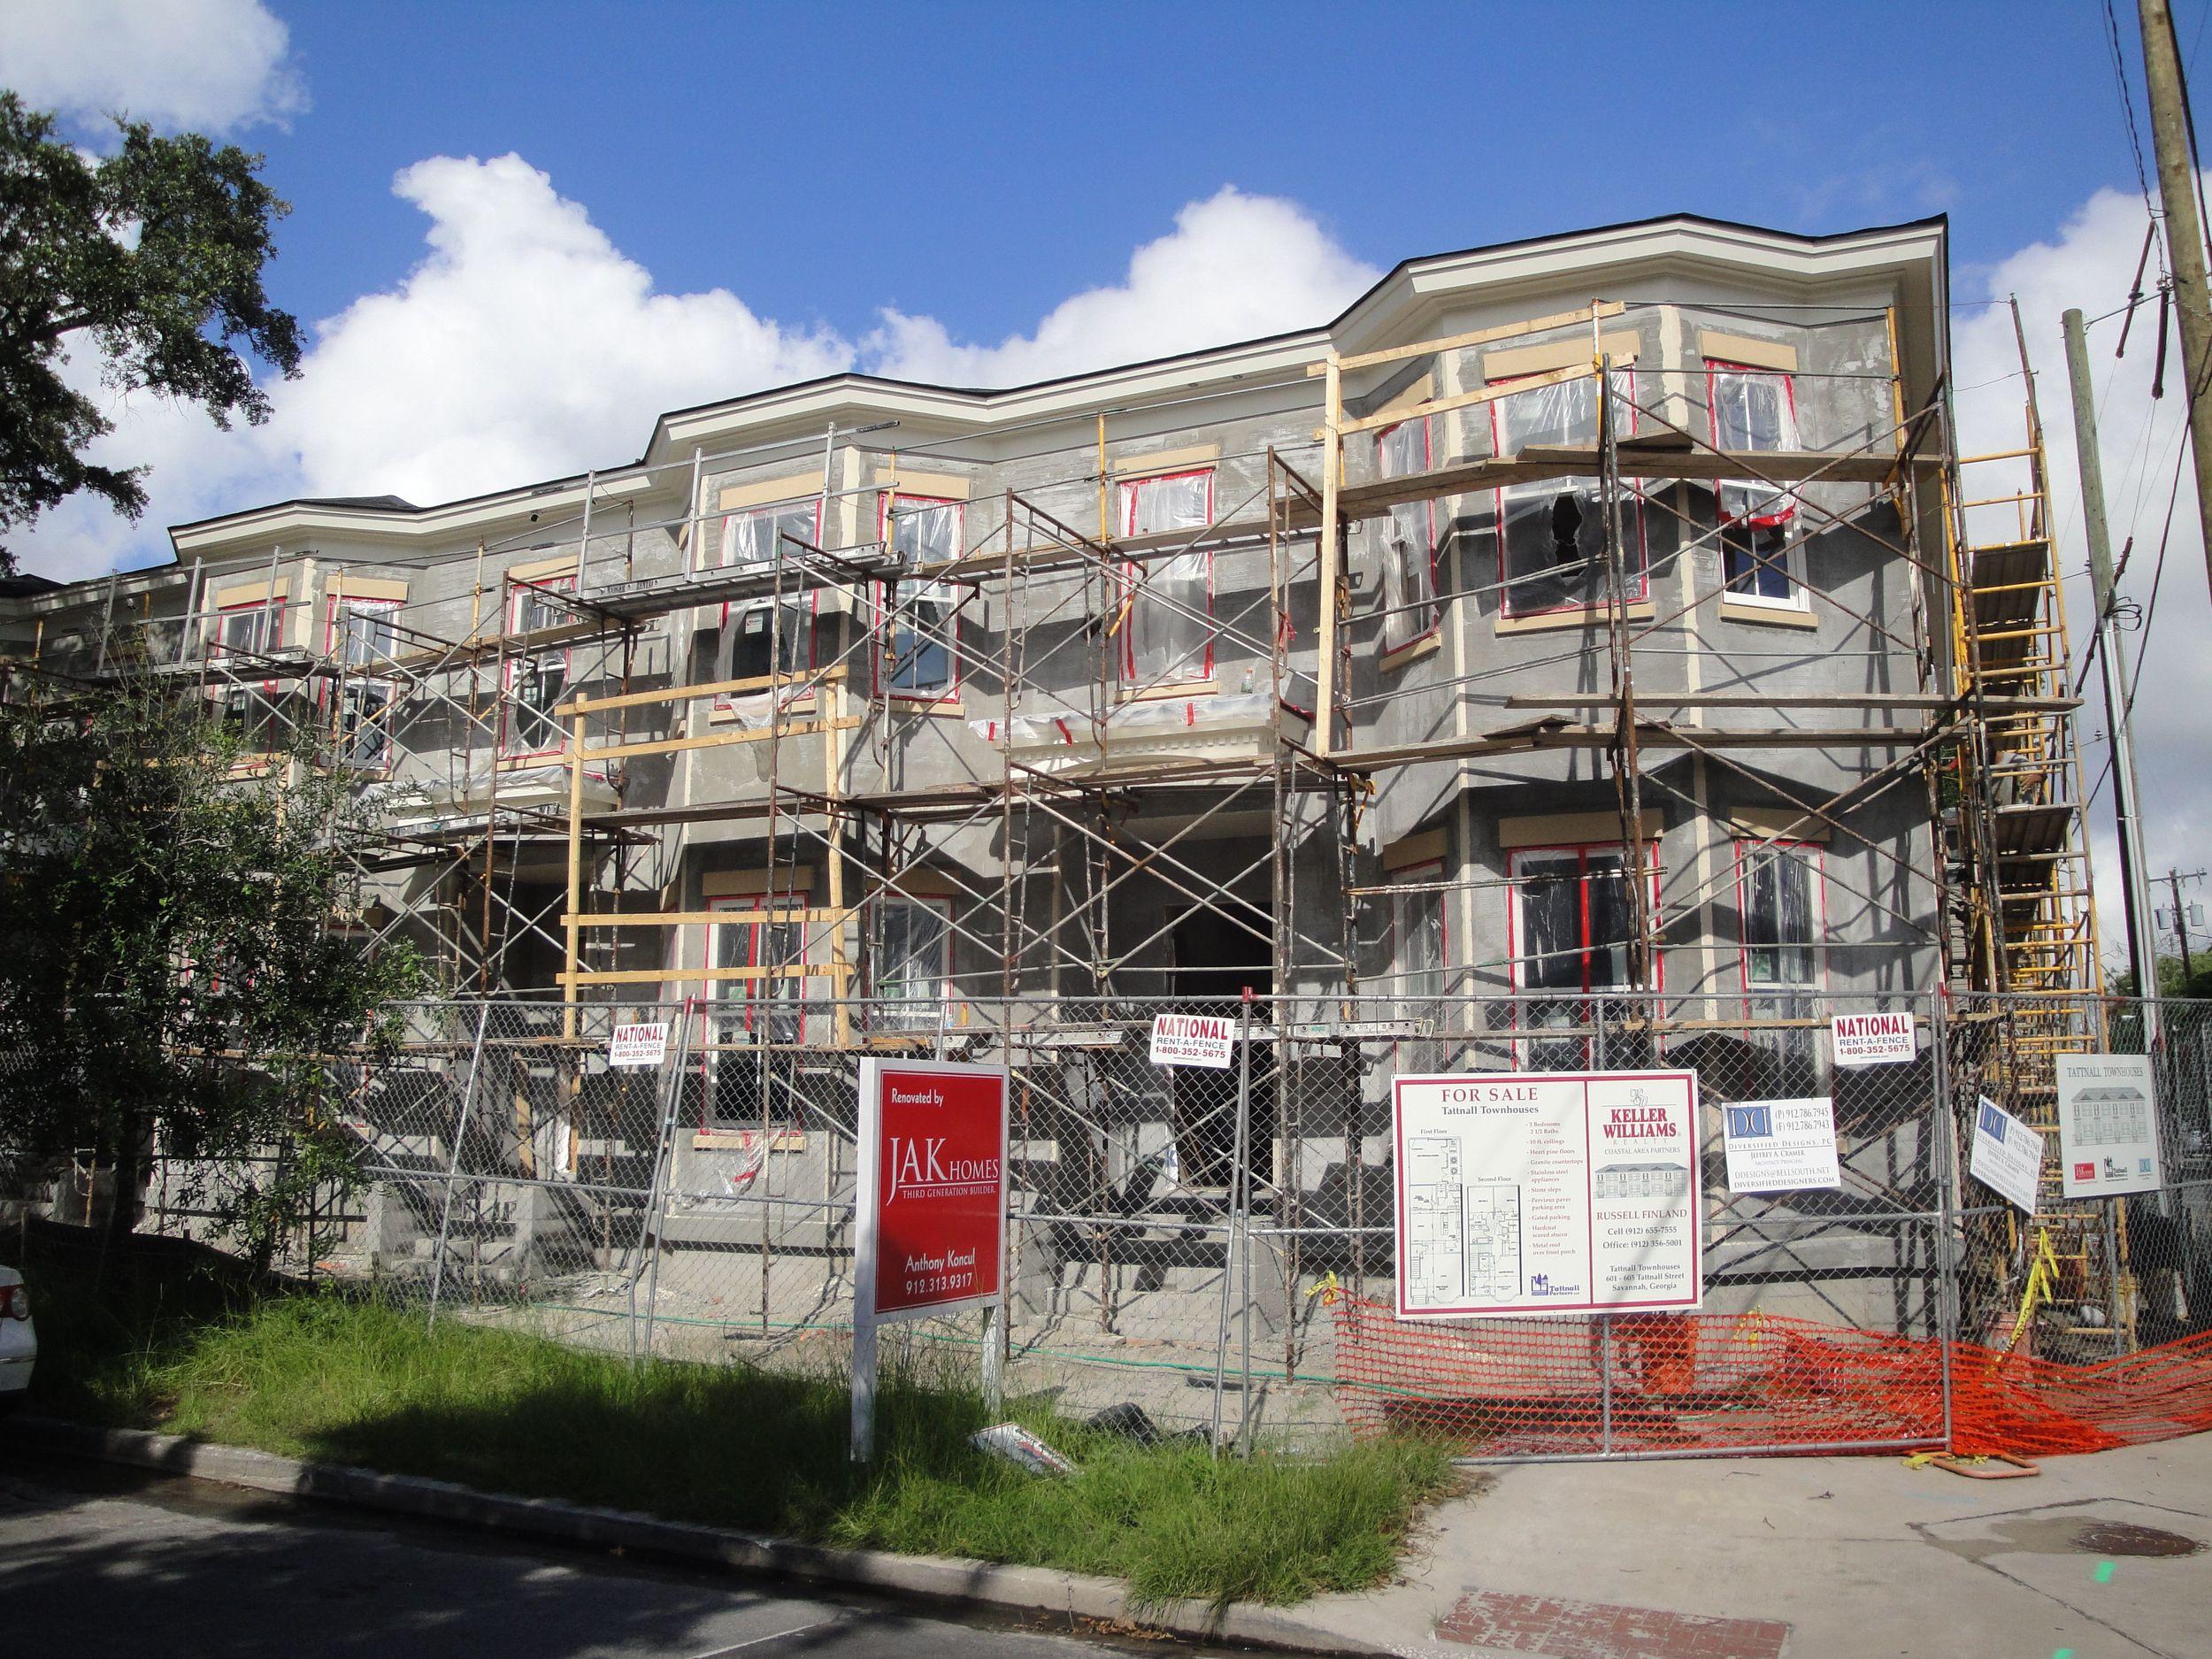 SAV - townhouses on Tattnall